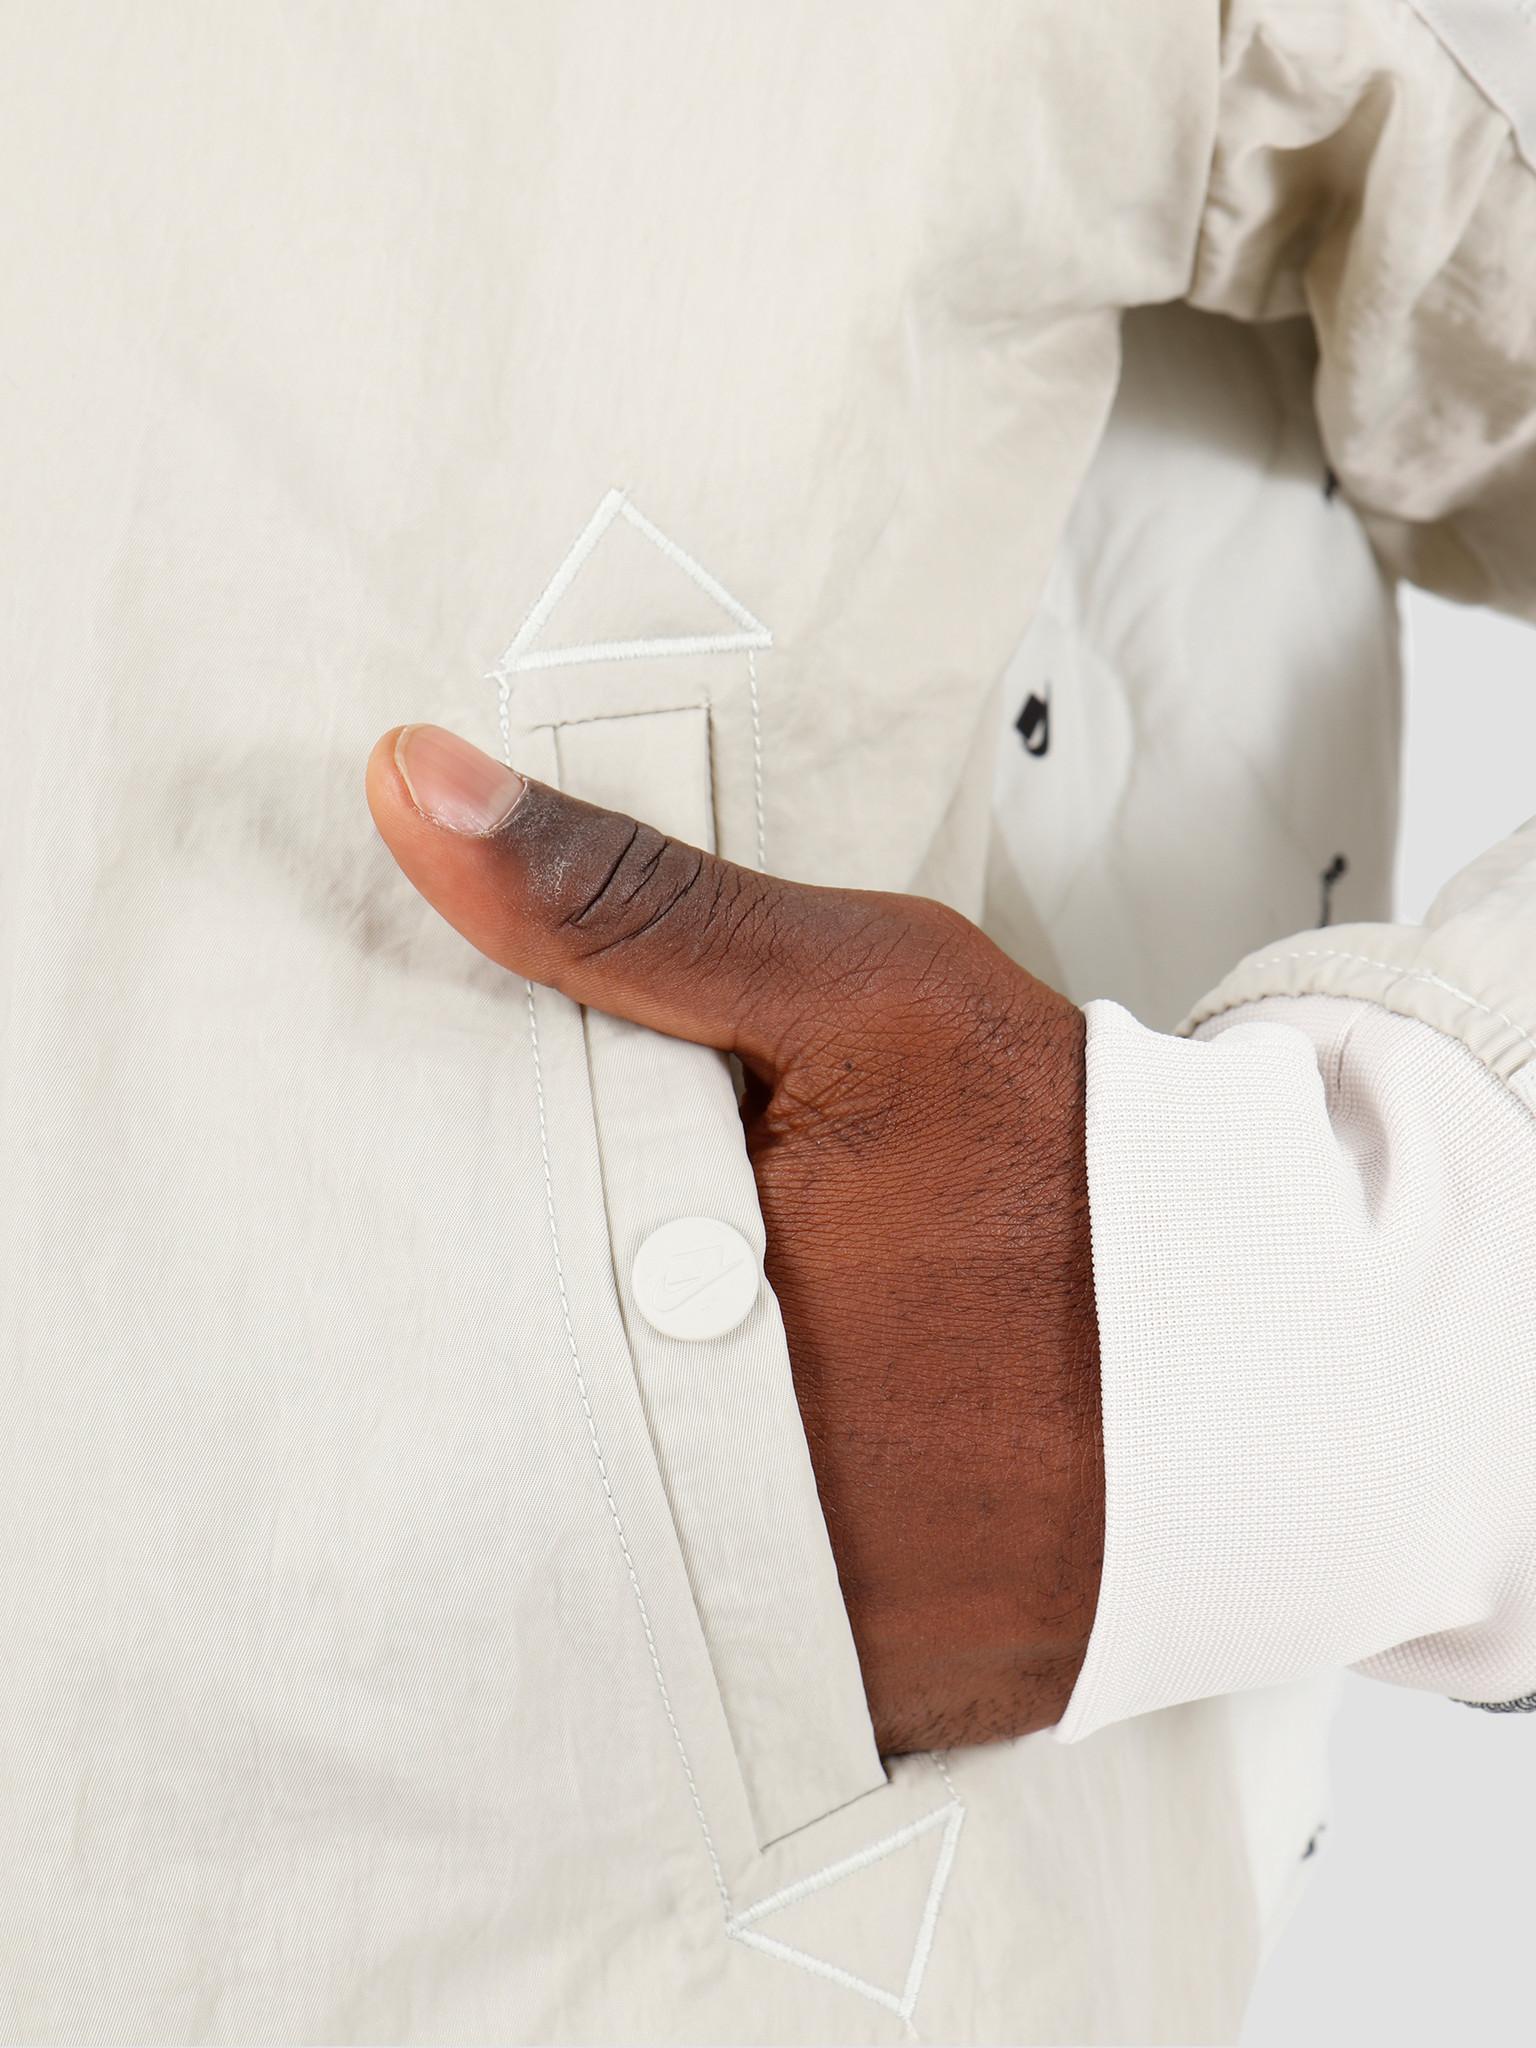 Nike Nike NSW Nsp Syn Fill Bober Jkt Light Bone Suit White Sail BV4532-072